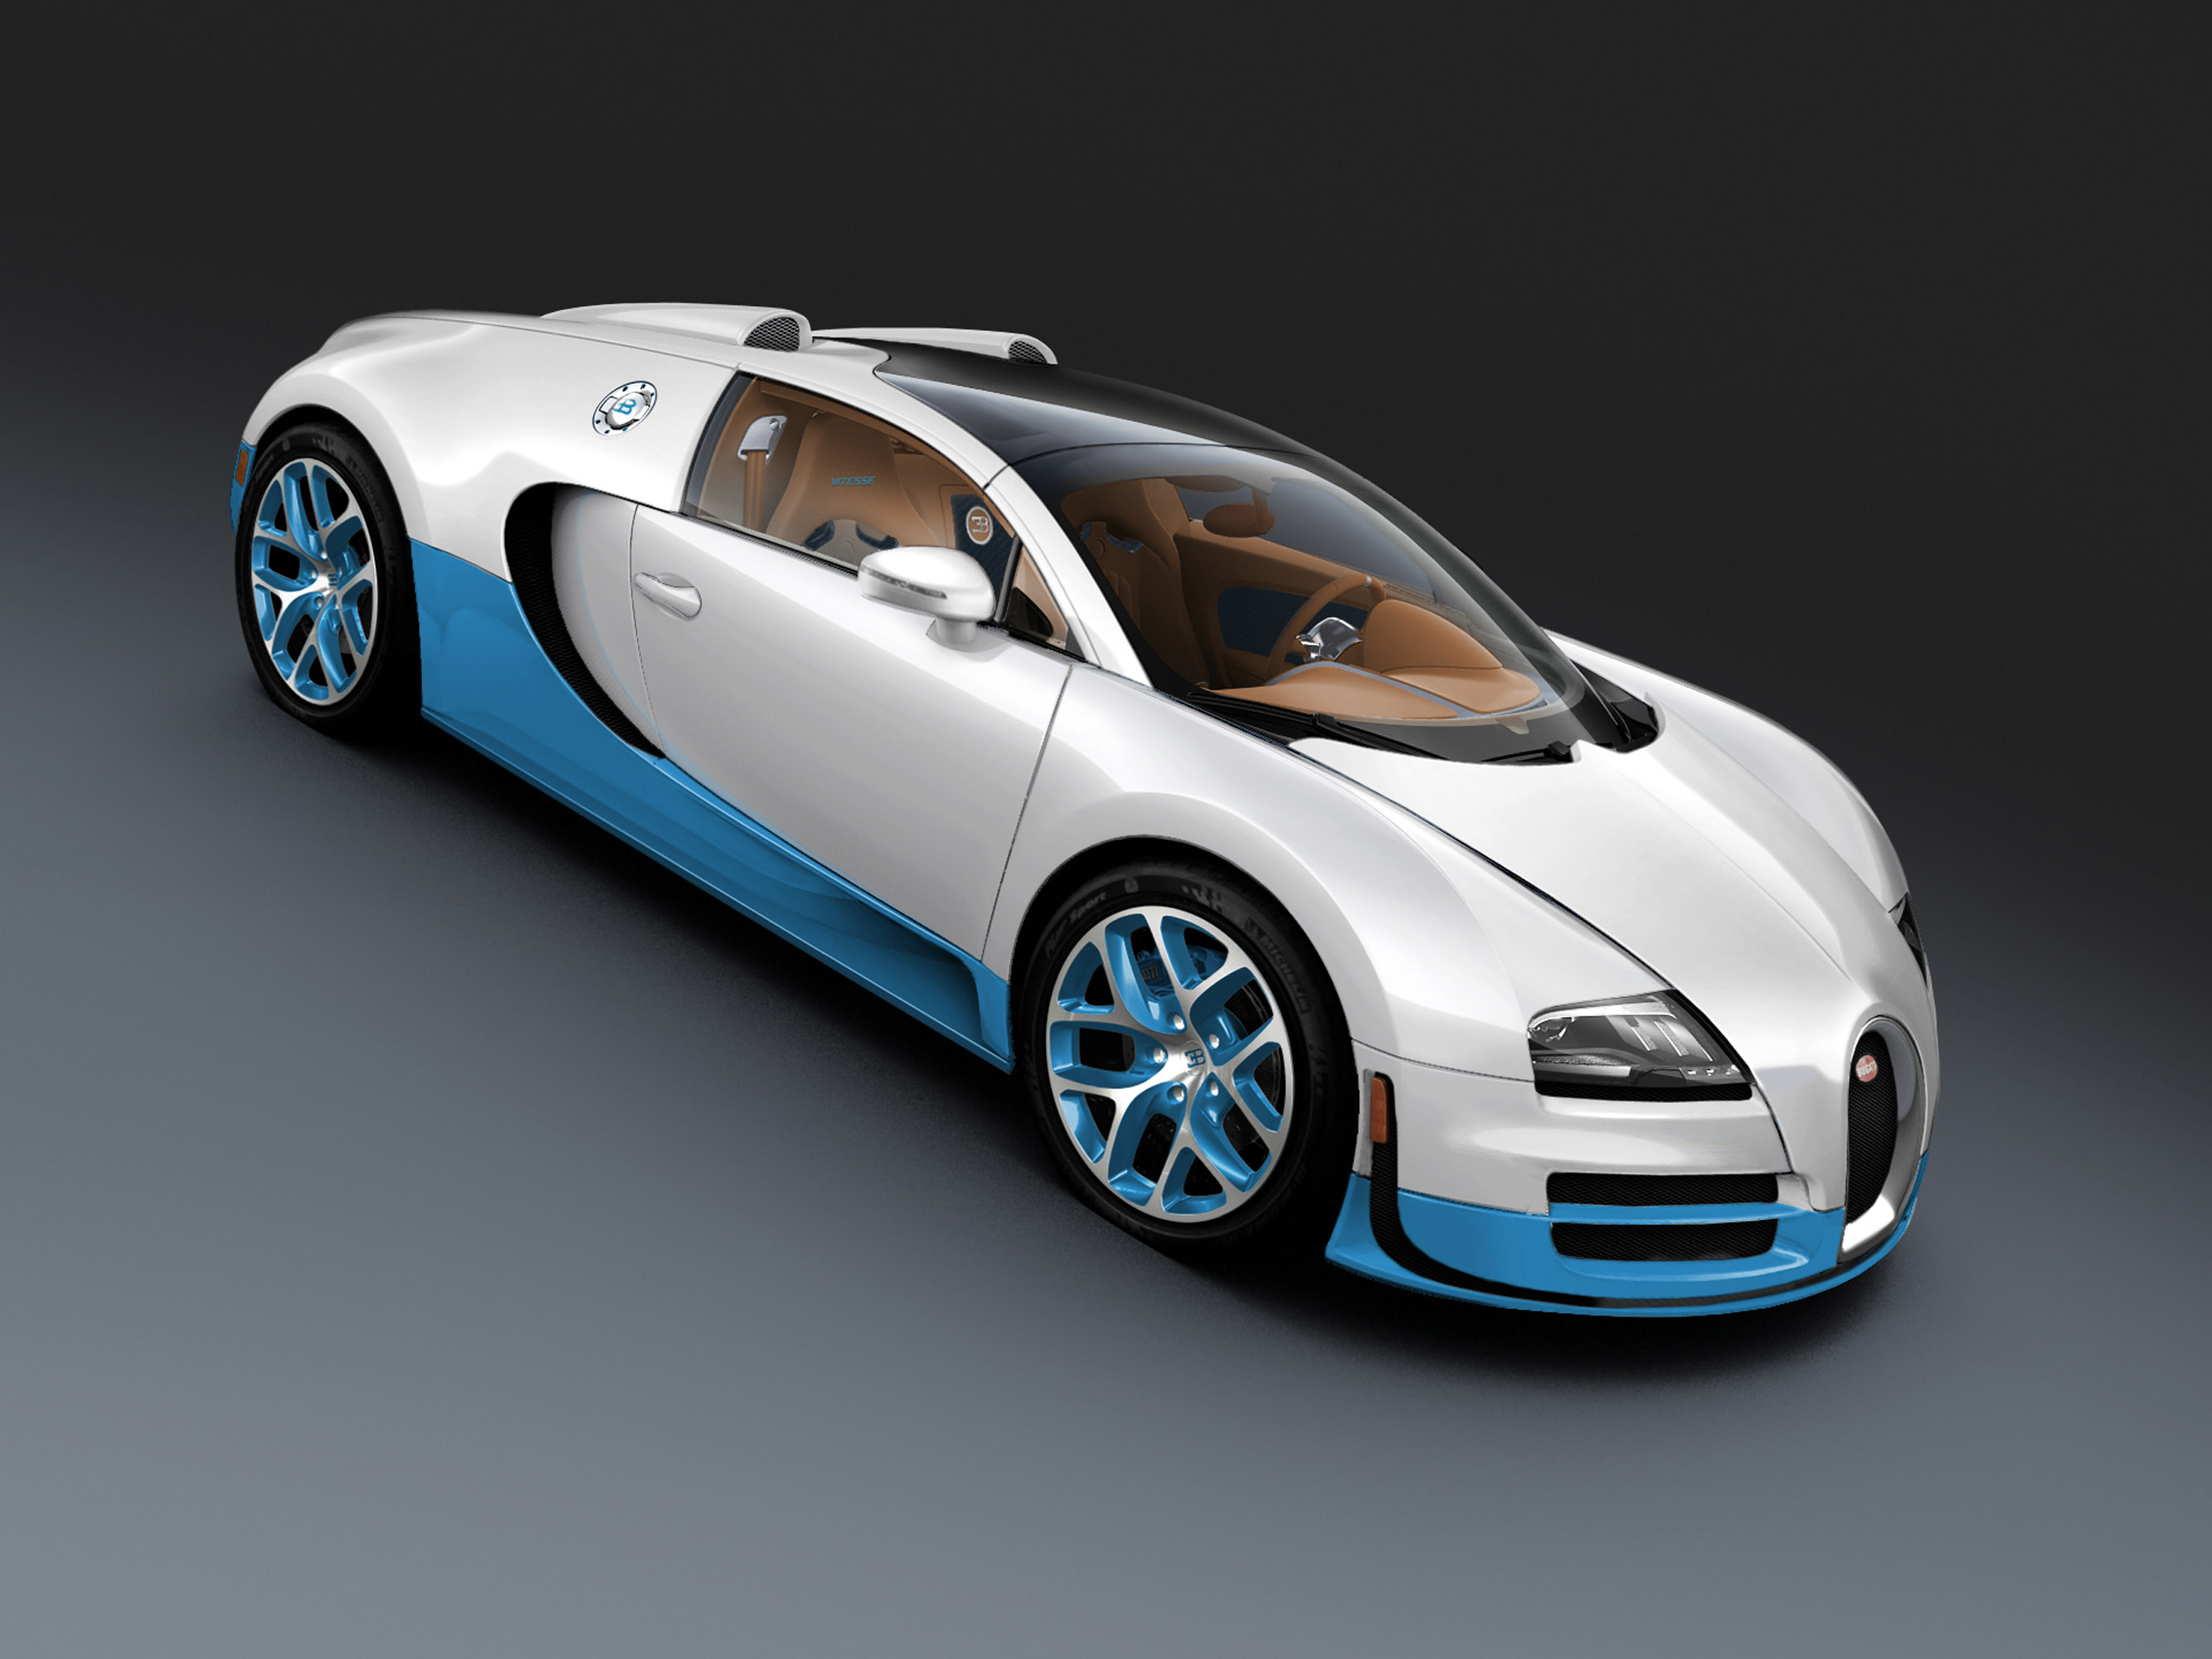 bugatti veyron 16 4 grand sport vitesse special edition debuts at the quail. Black Bedroom Furniture Sets. Home Design Ideas